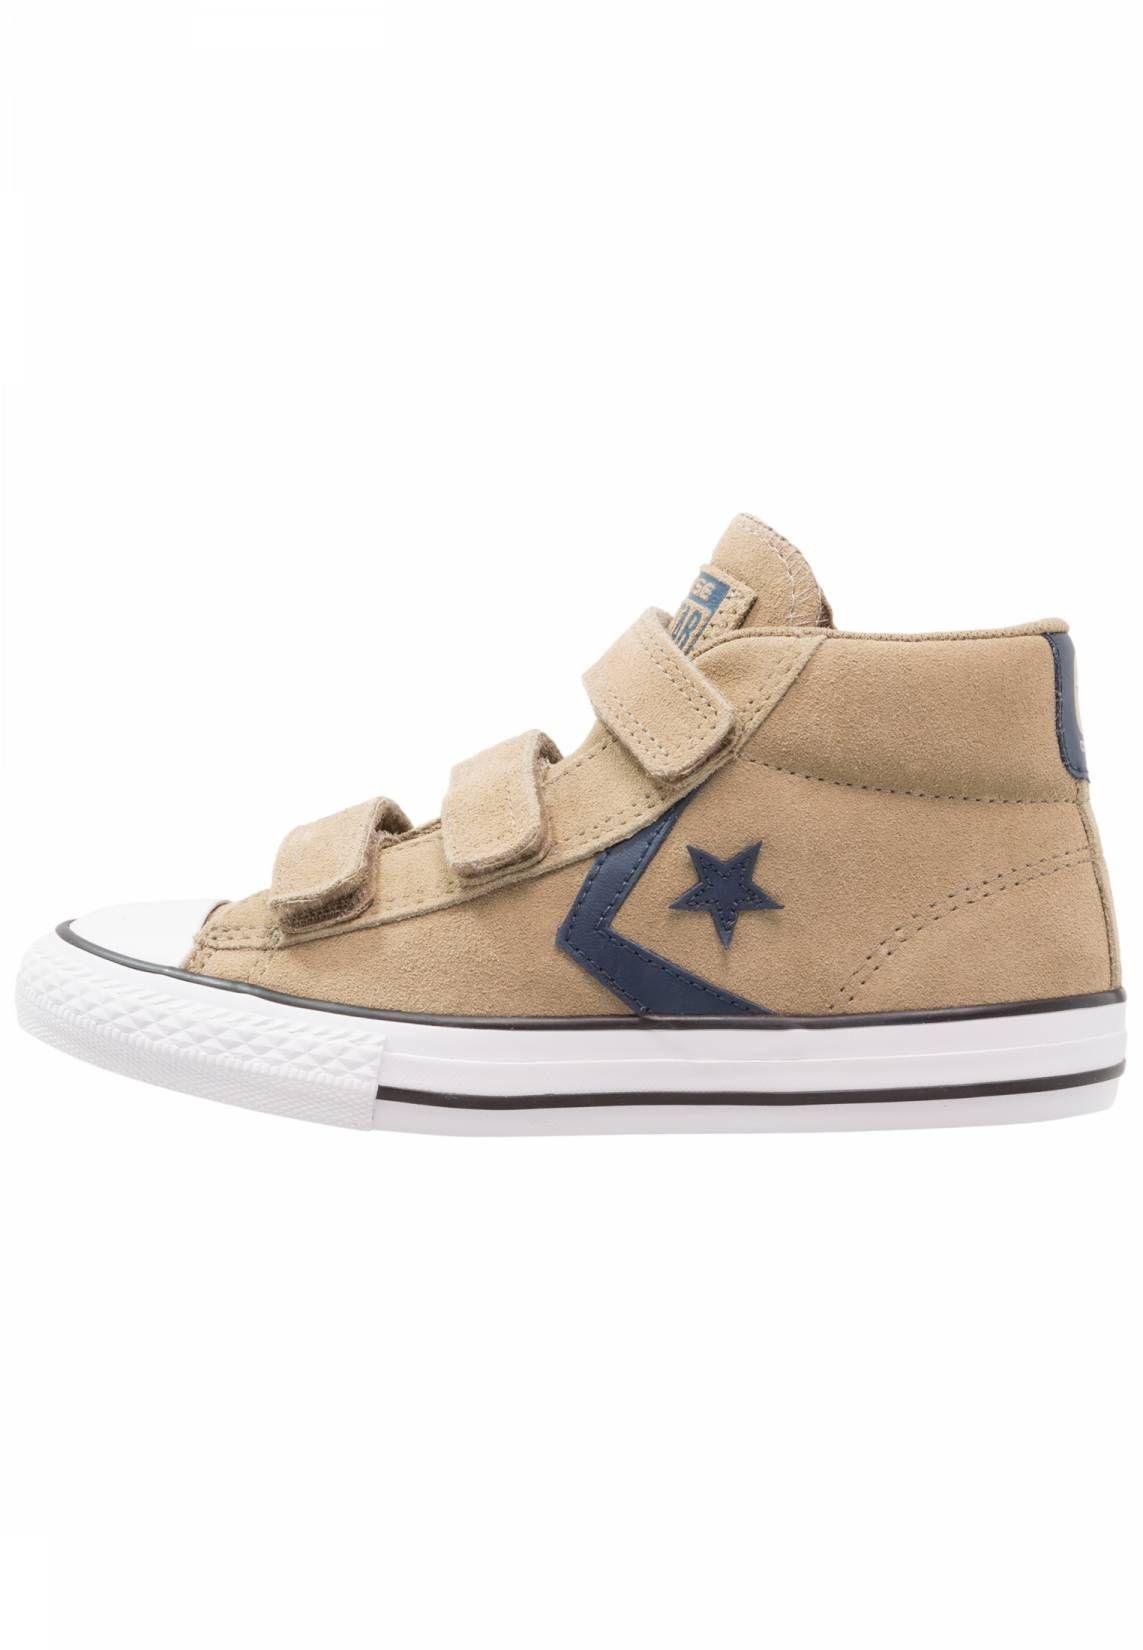 04f15dfc6 Converse. STAR PLAYER EV 3V - Zapatillas altas - sandy khaki navy ...